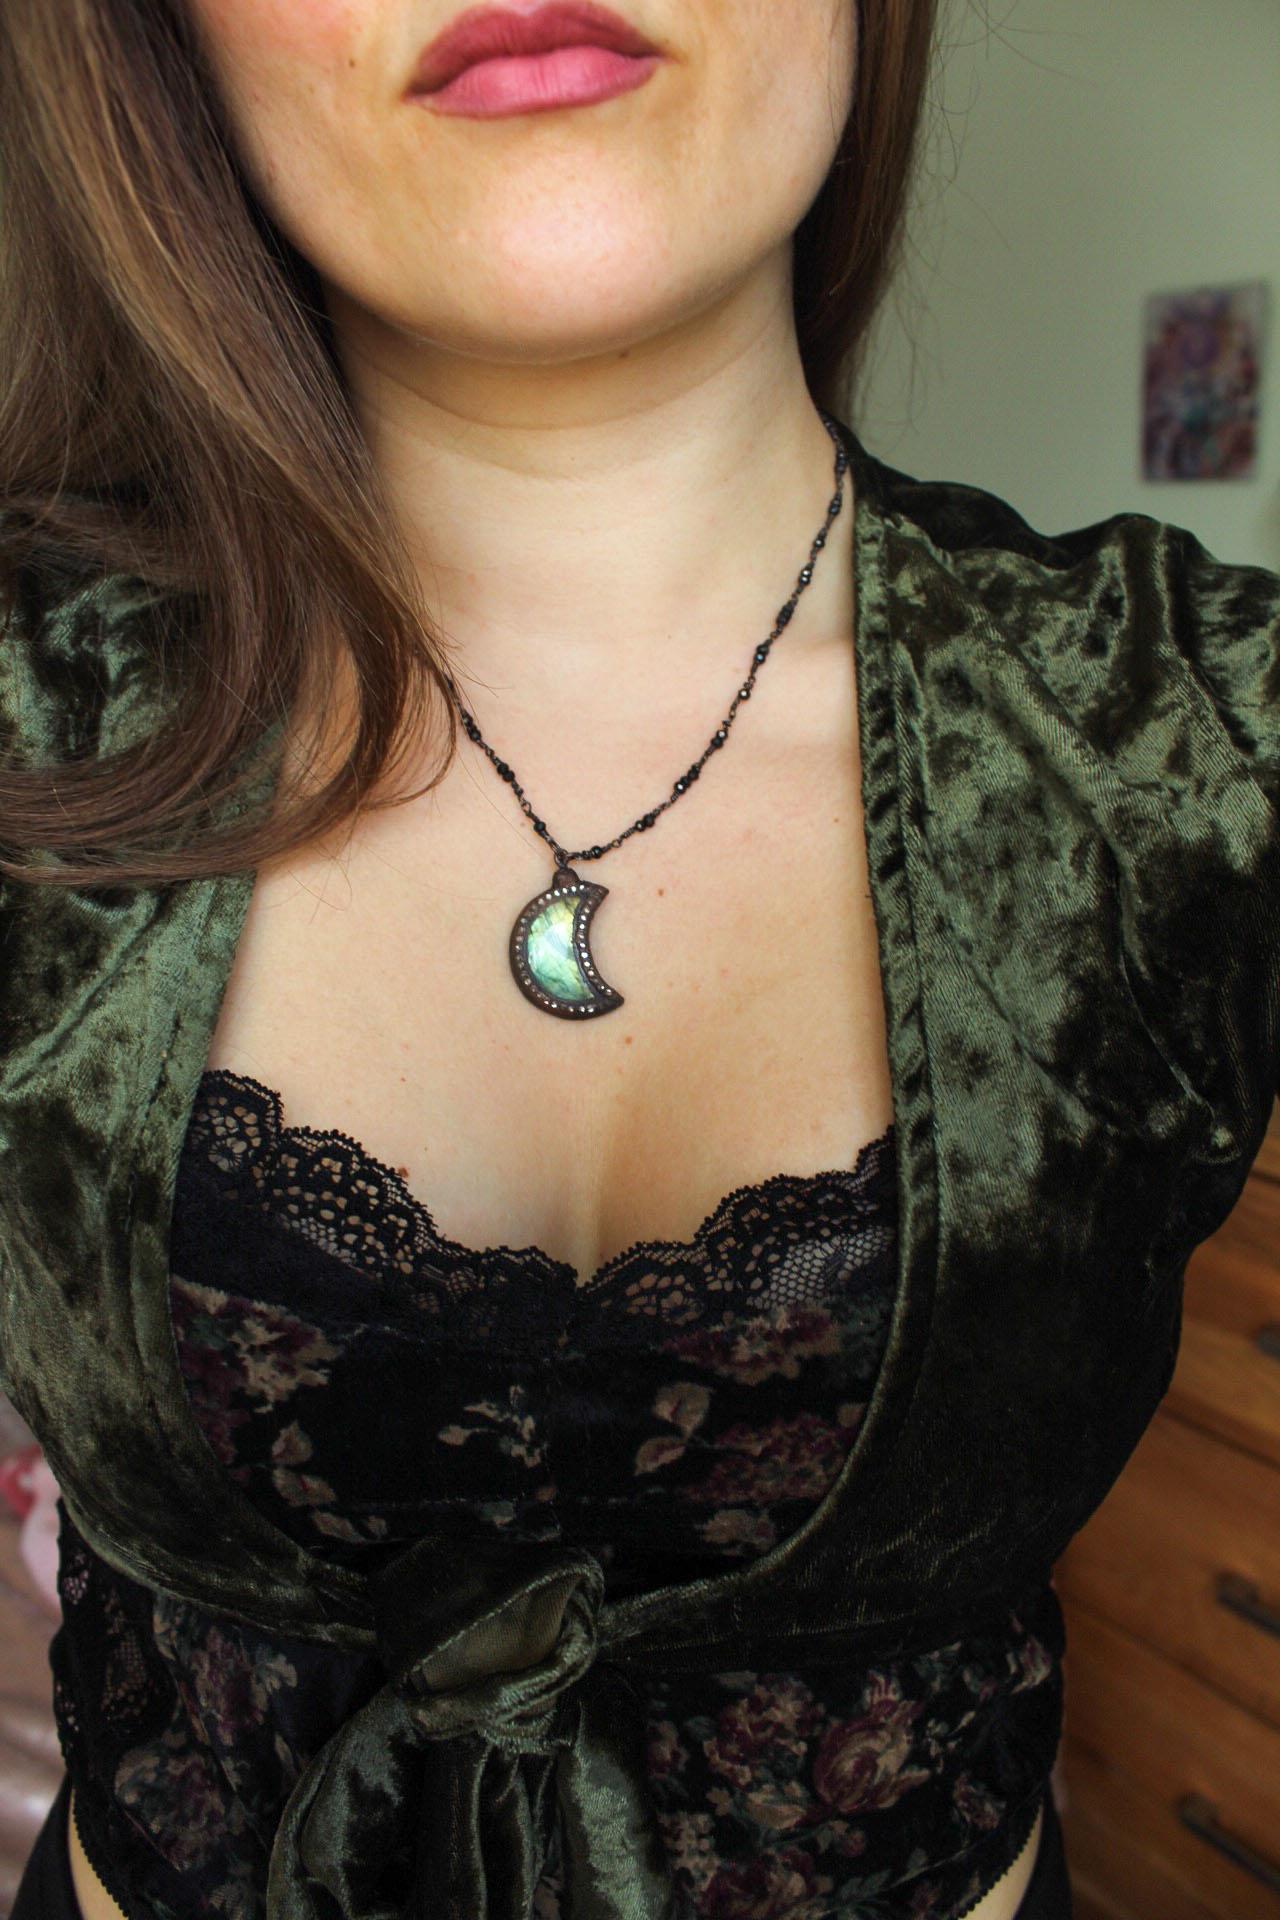 Labradorite Moon Necklace in Golden Green with Swarovski Crystals